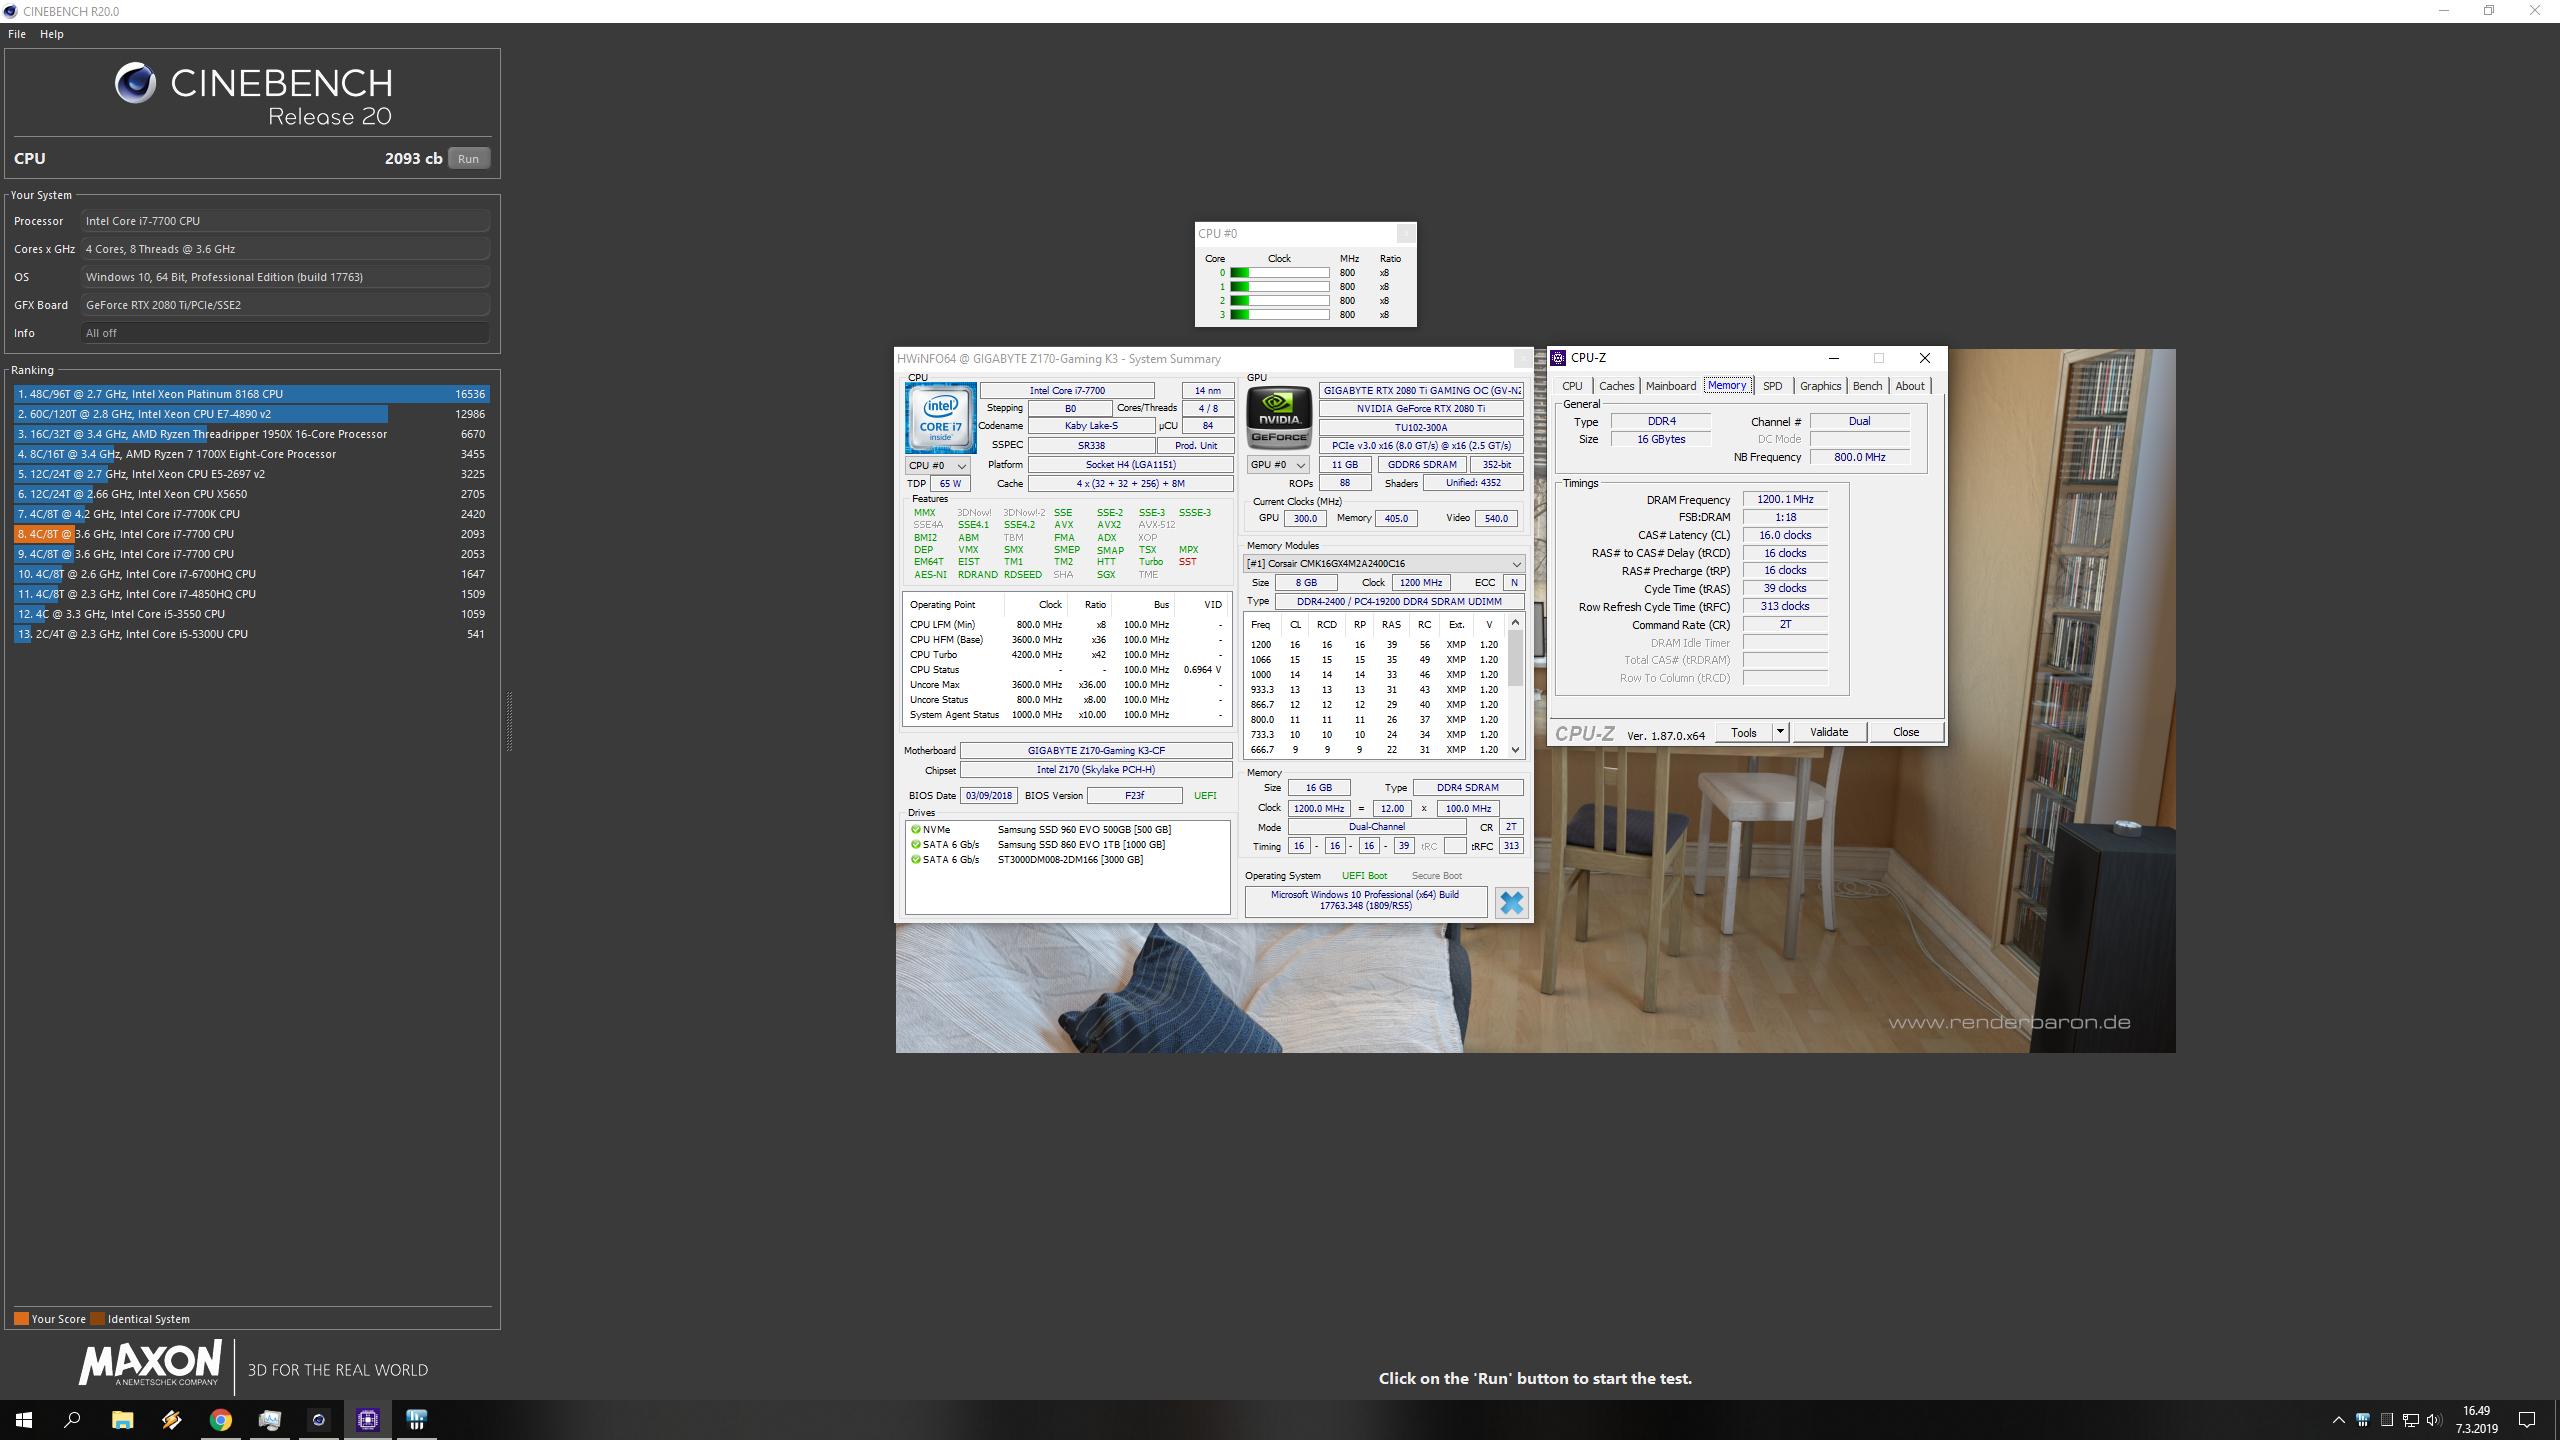 Desktop Screenshot 2019.03.07 - 16.49.12.06.png